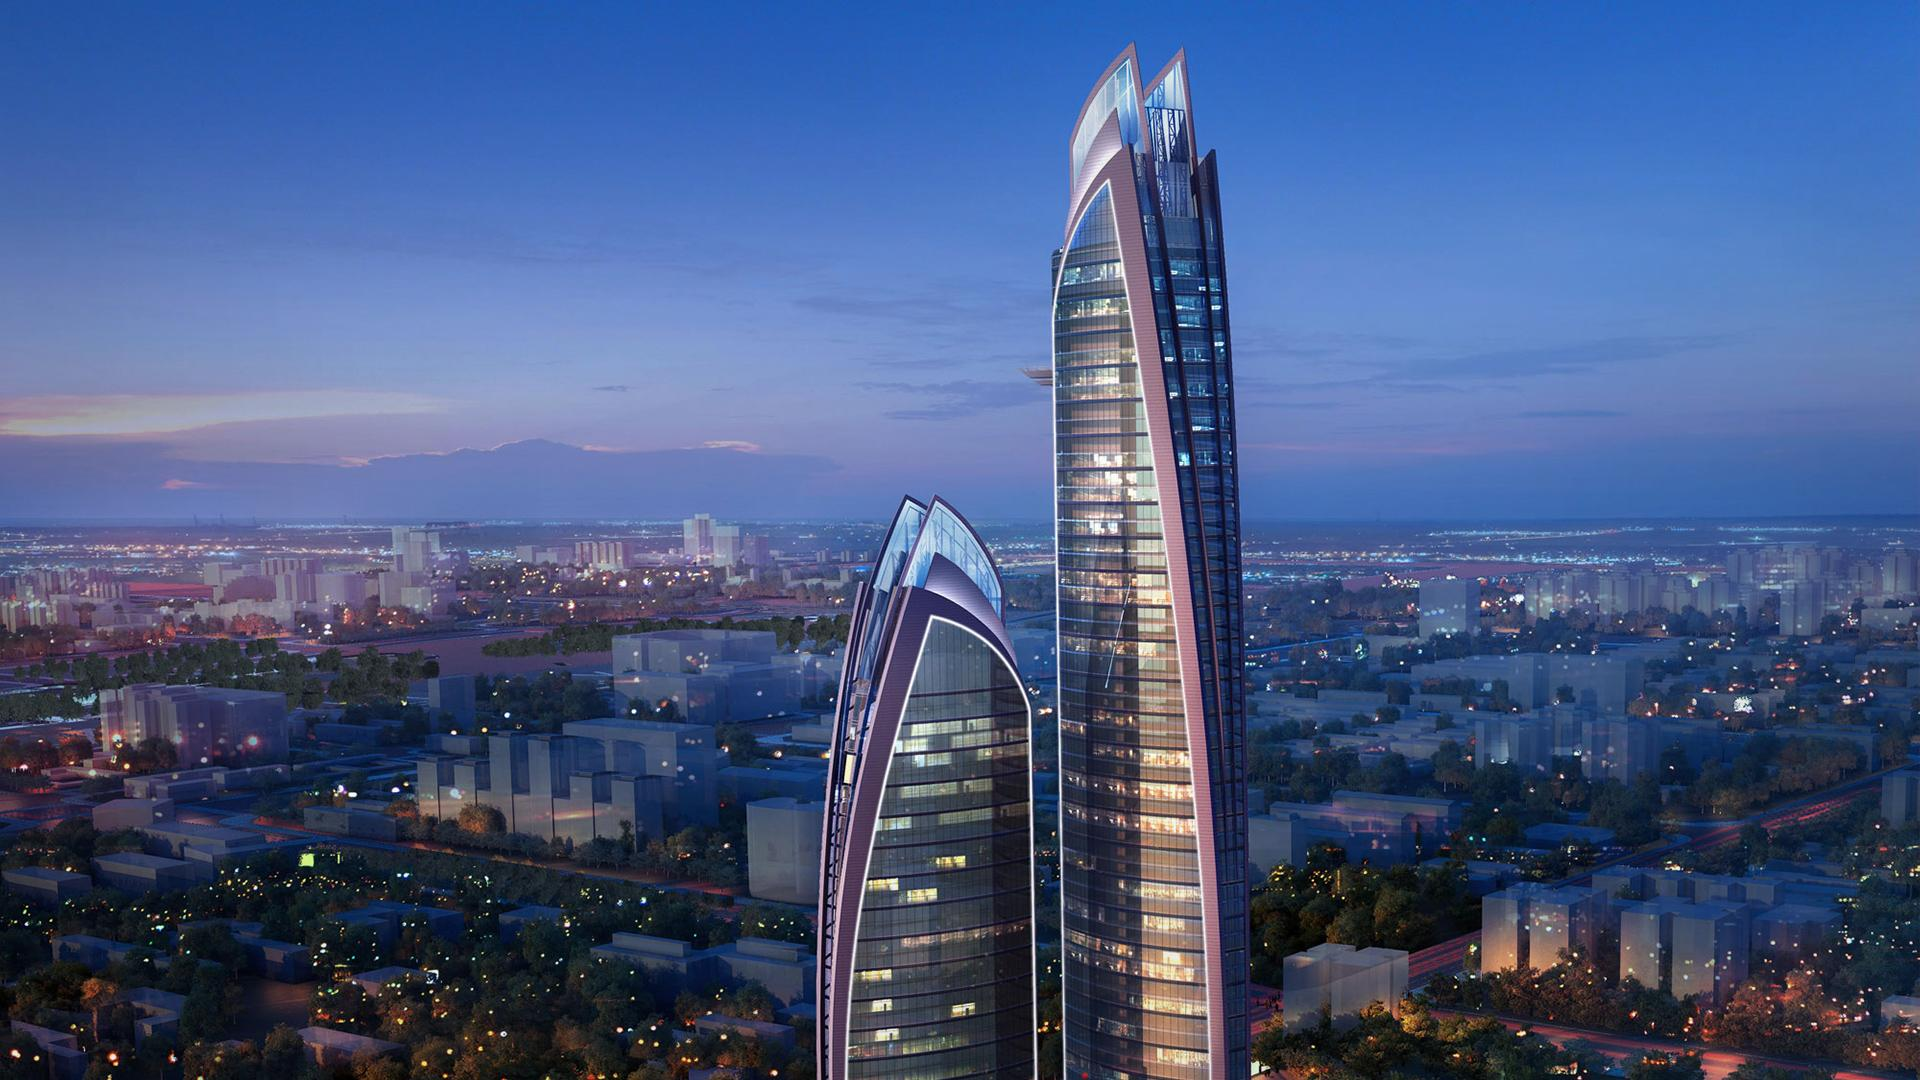 Un grupo chino compró gran parte de Hilton Worldwide